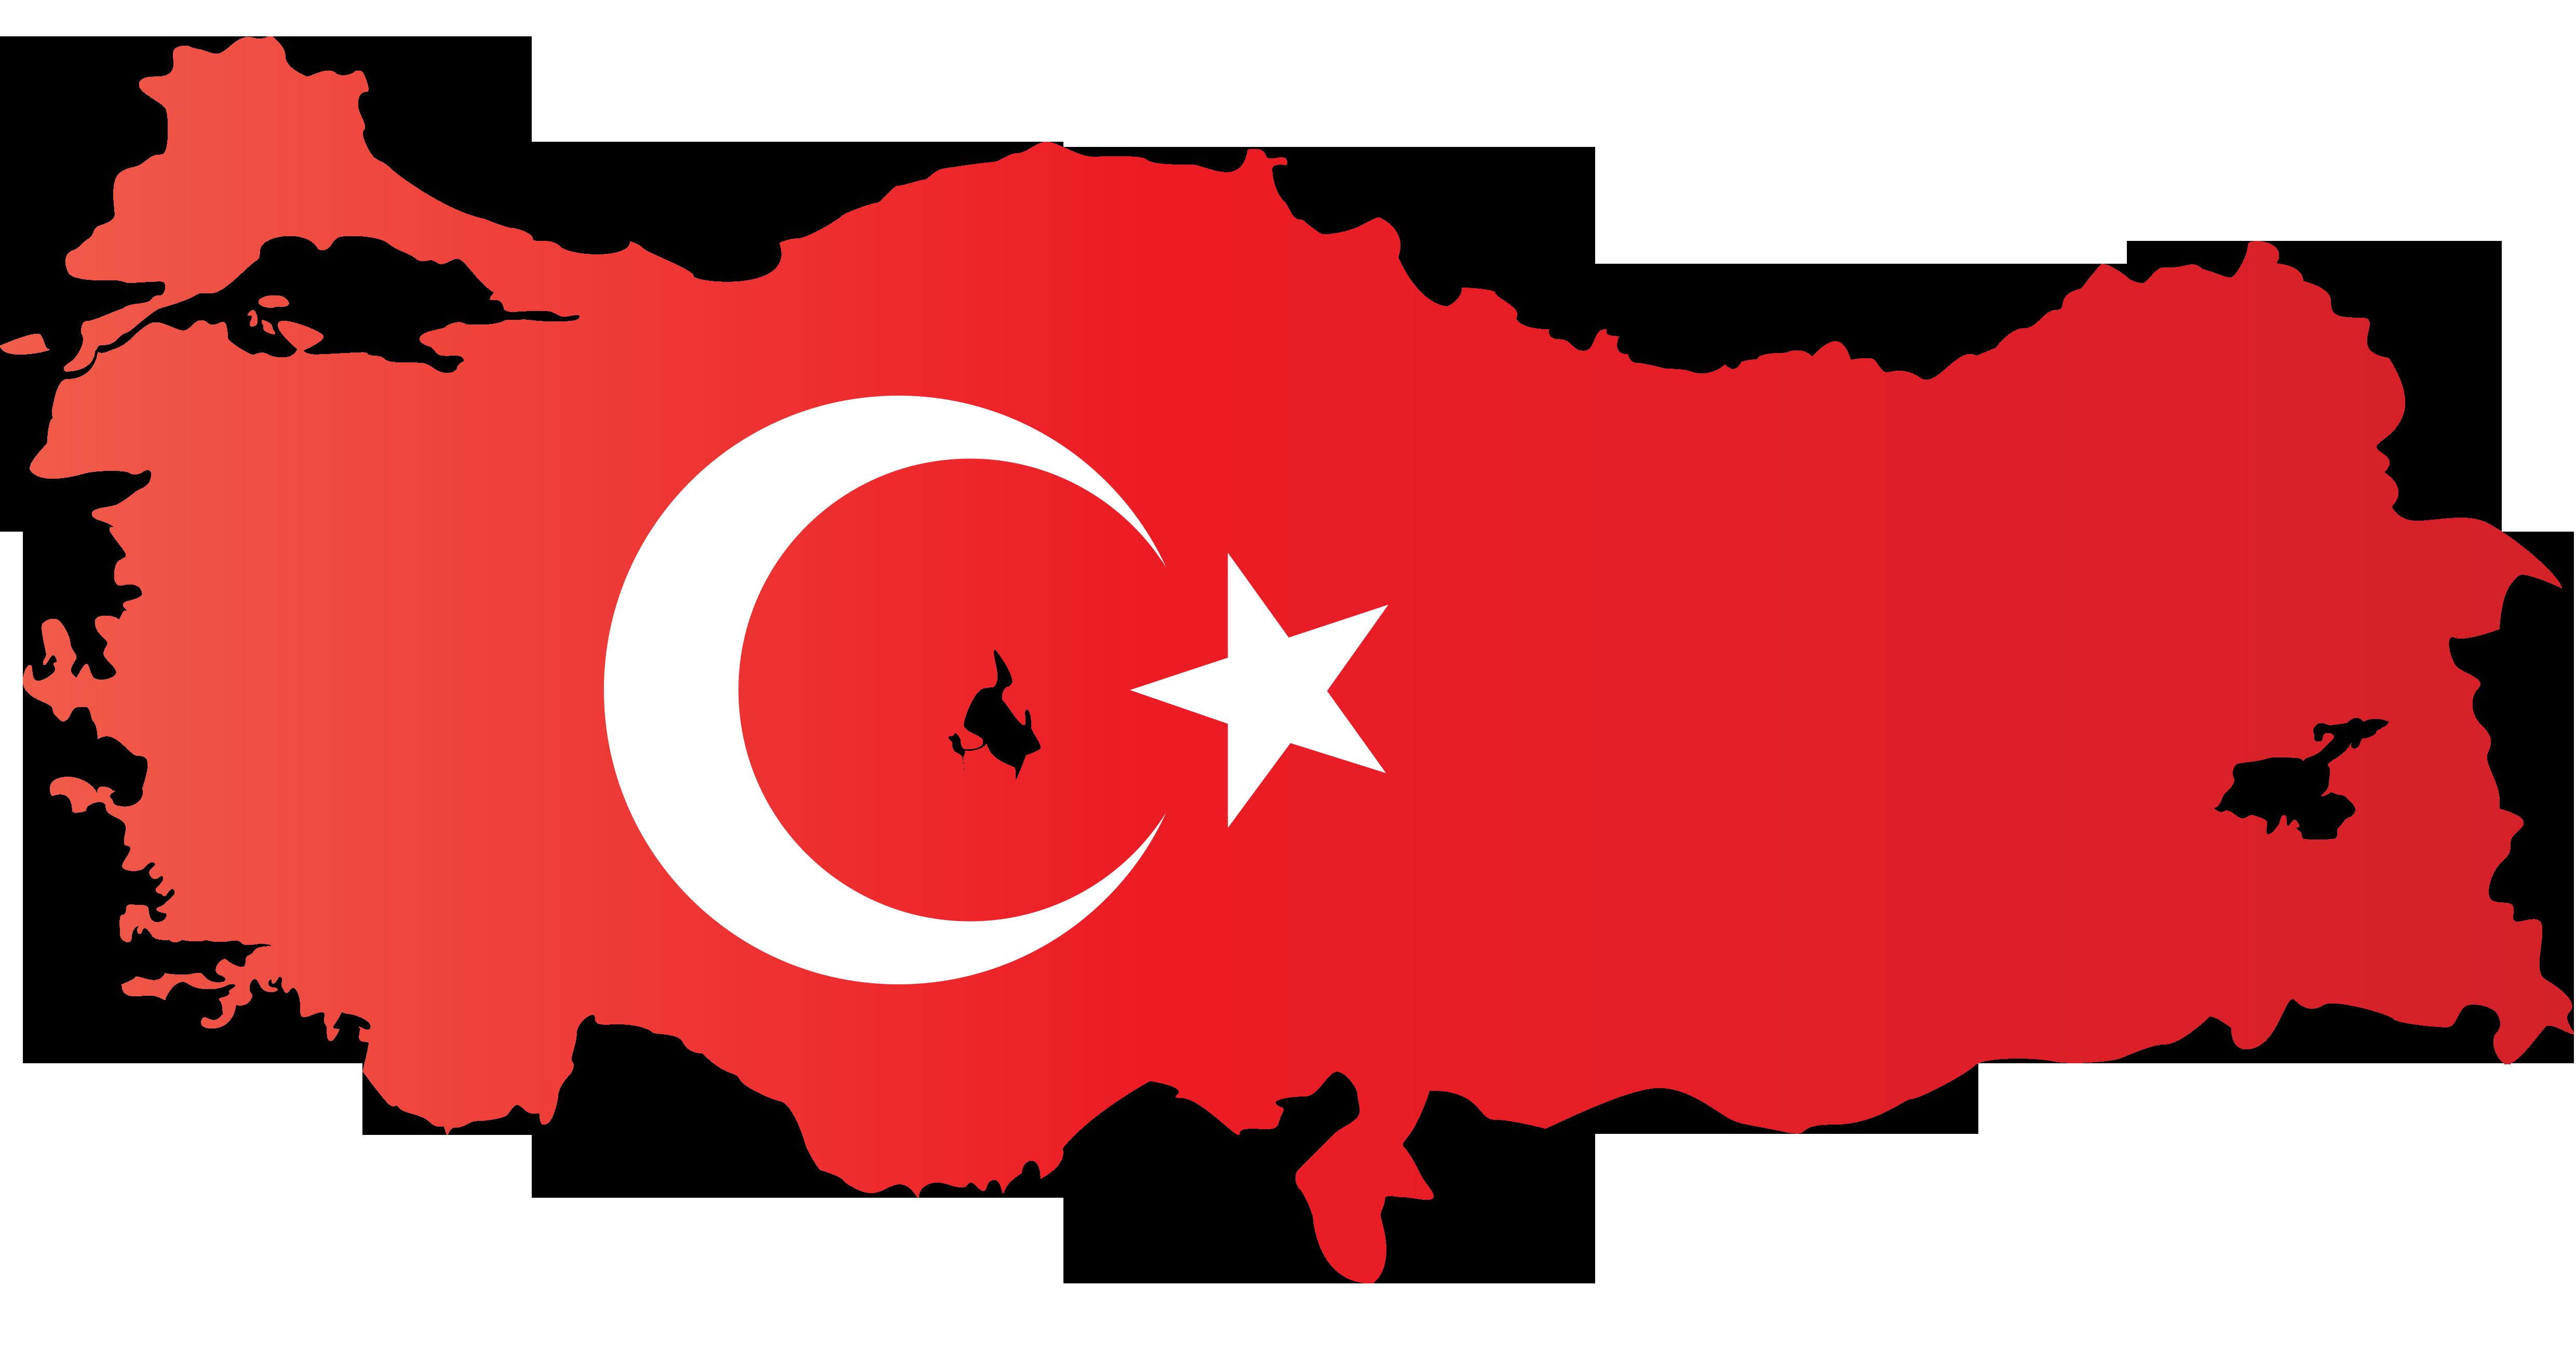 Ay Yildizli Turkiye Haritasi Sablonu Png Formatinda Meb Ders